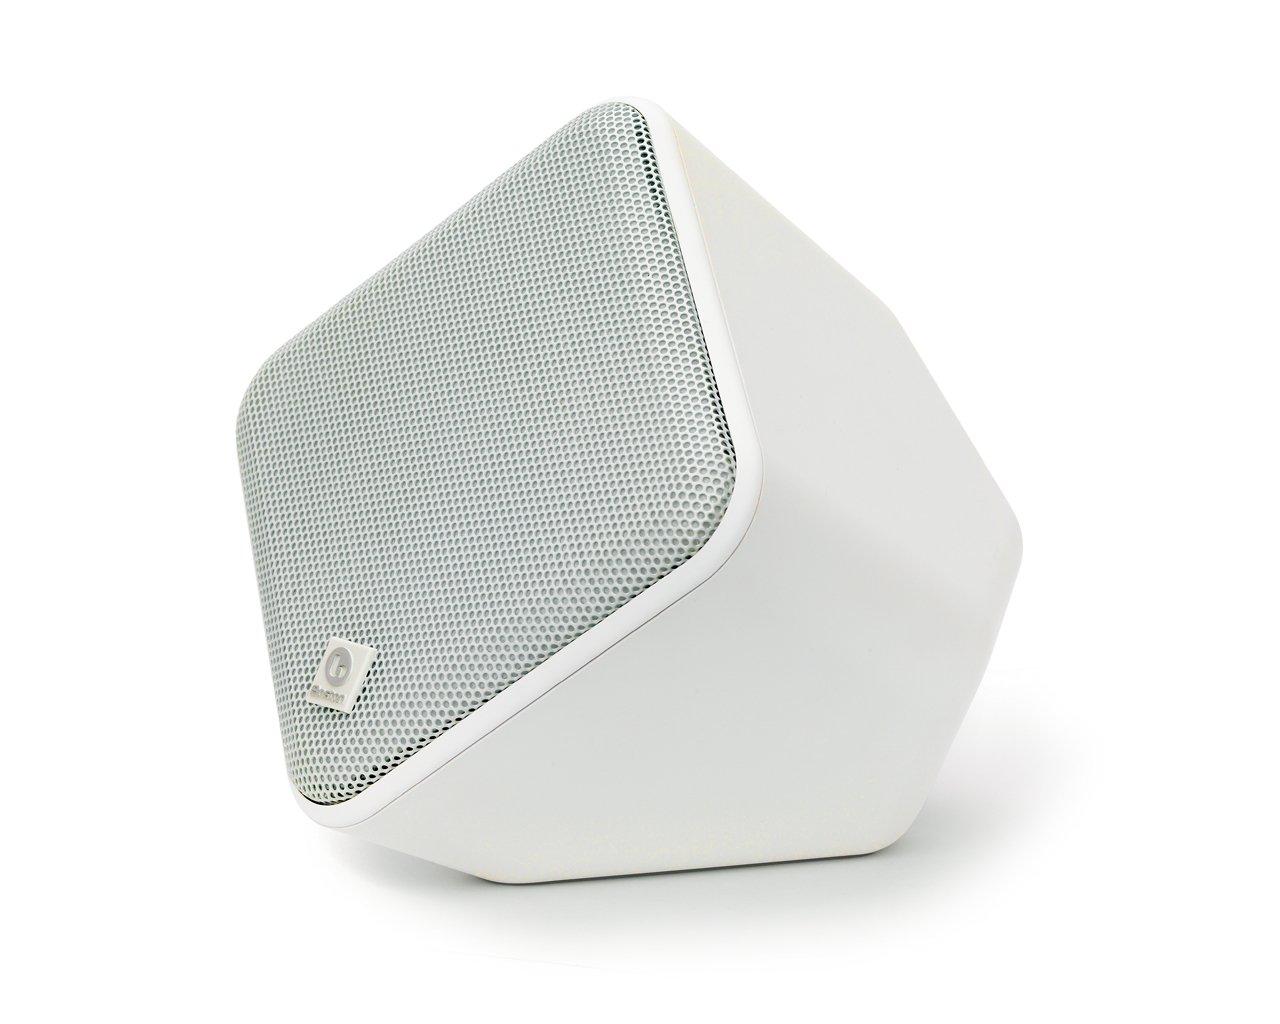 Boston Acoustics SoundWare XS Satellite Speaker - Black - Each SoundWare Cube